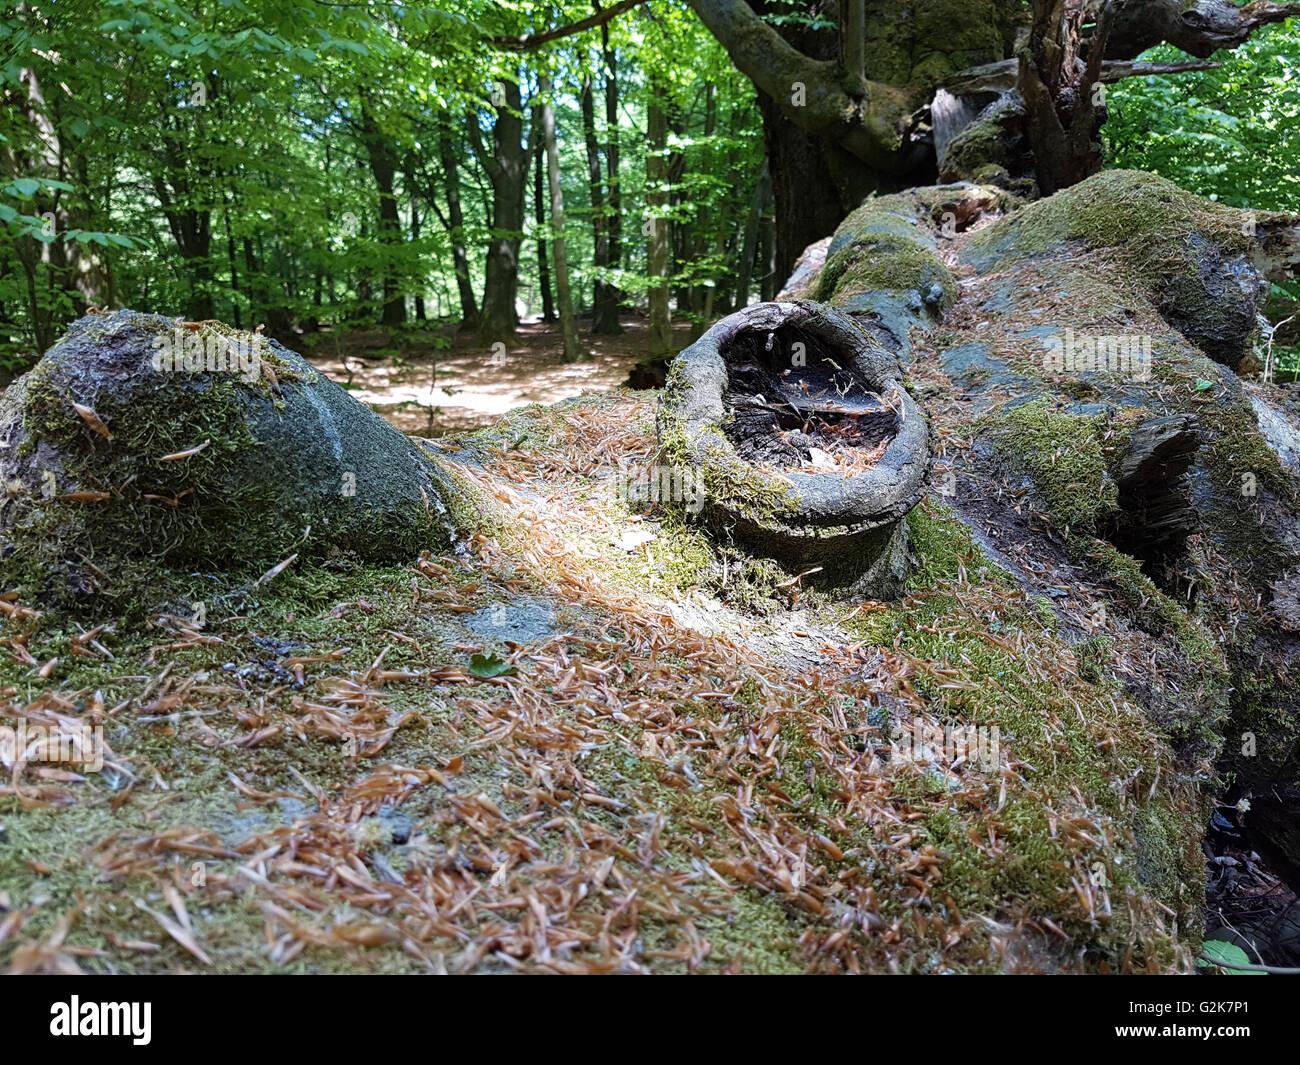 Urwald, Baumriesen, Totholz - Stock Image